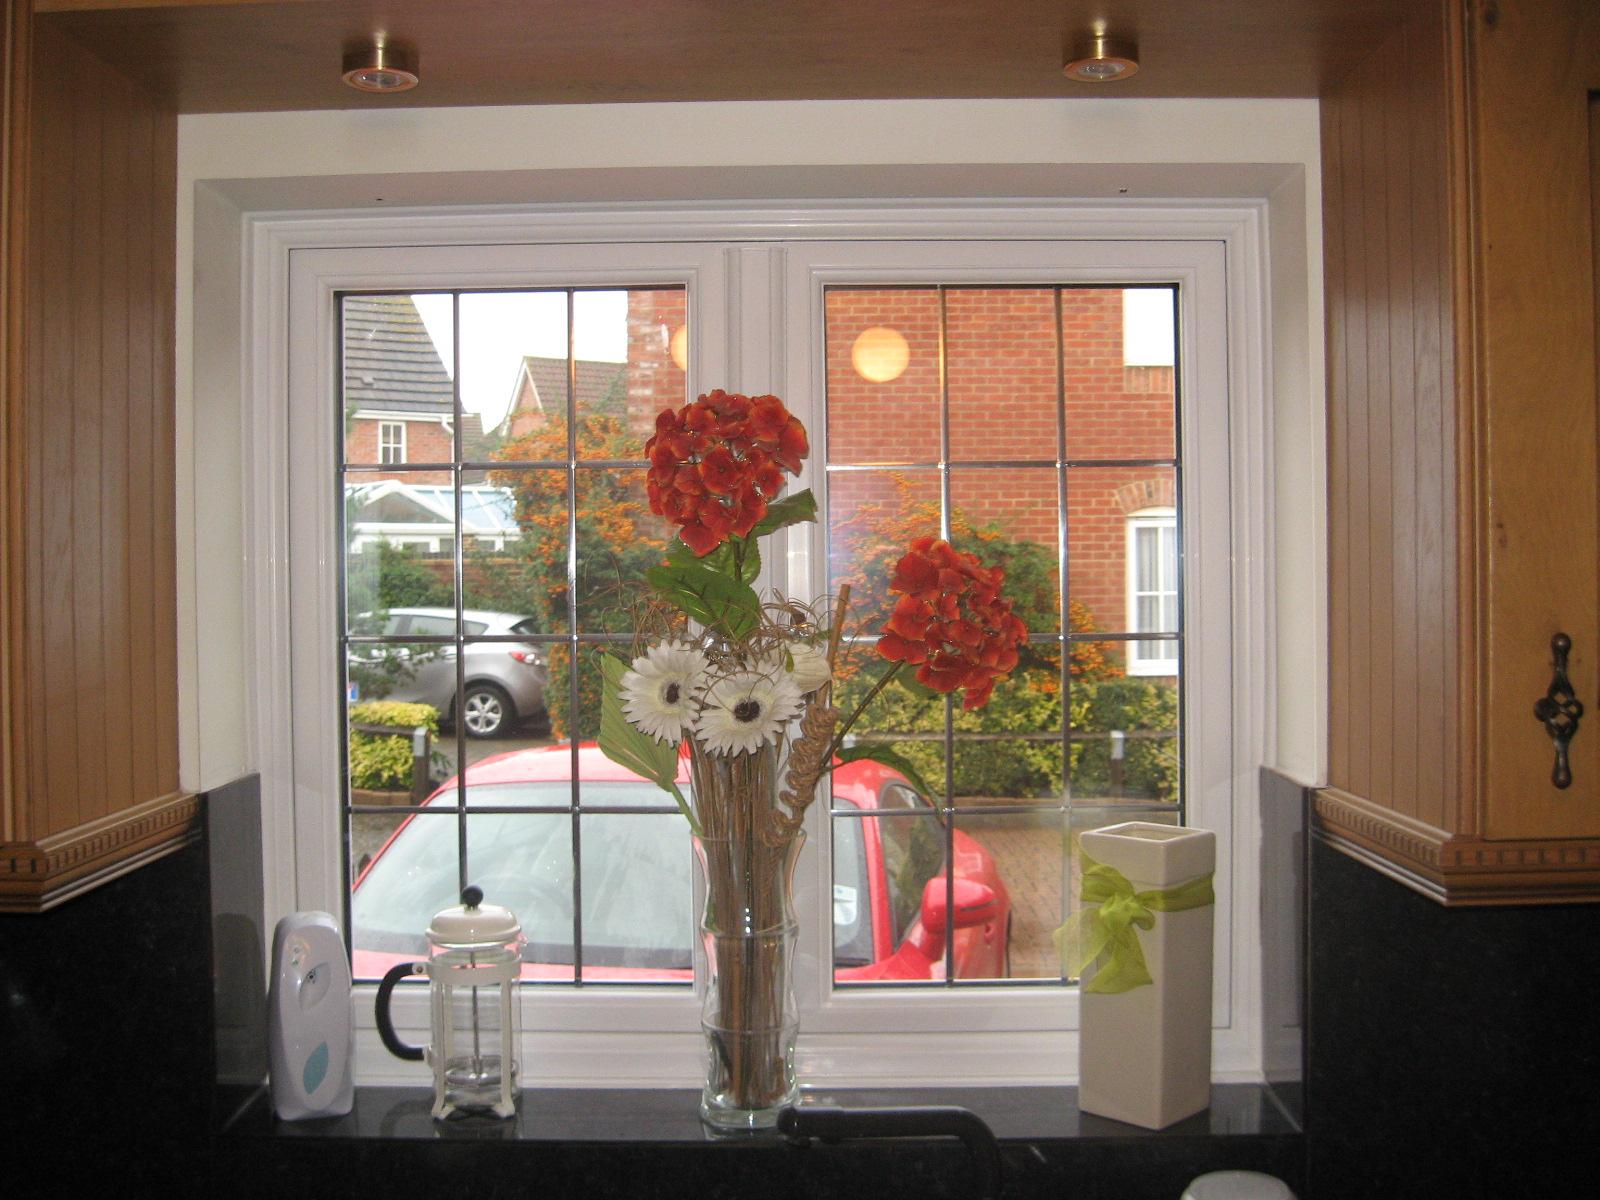 New Windows & Doors, Orangeries, Roofs, Extentions, Sovereign Home, Essex (2476)